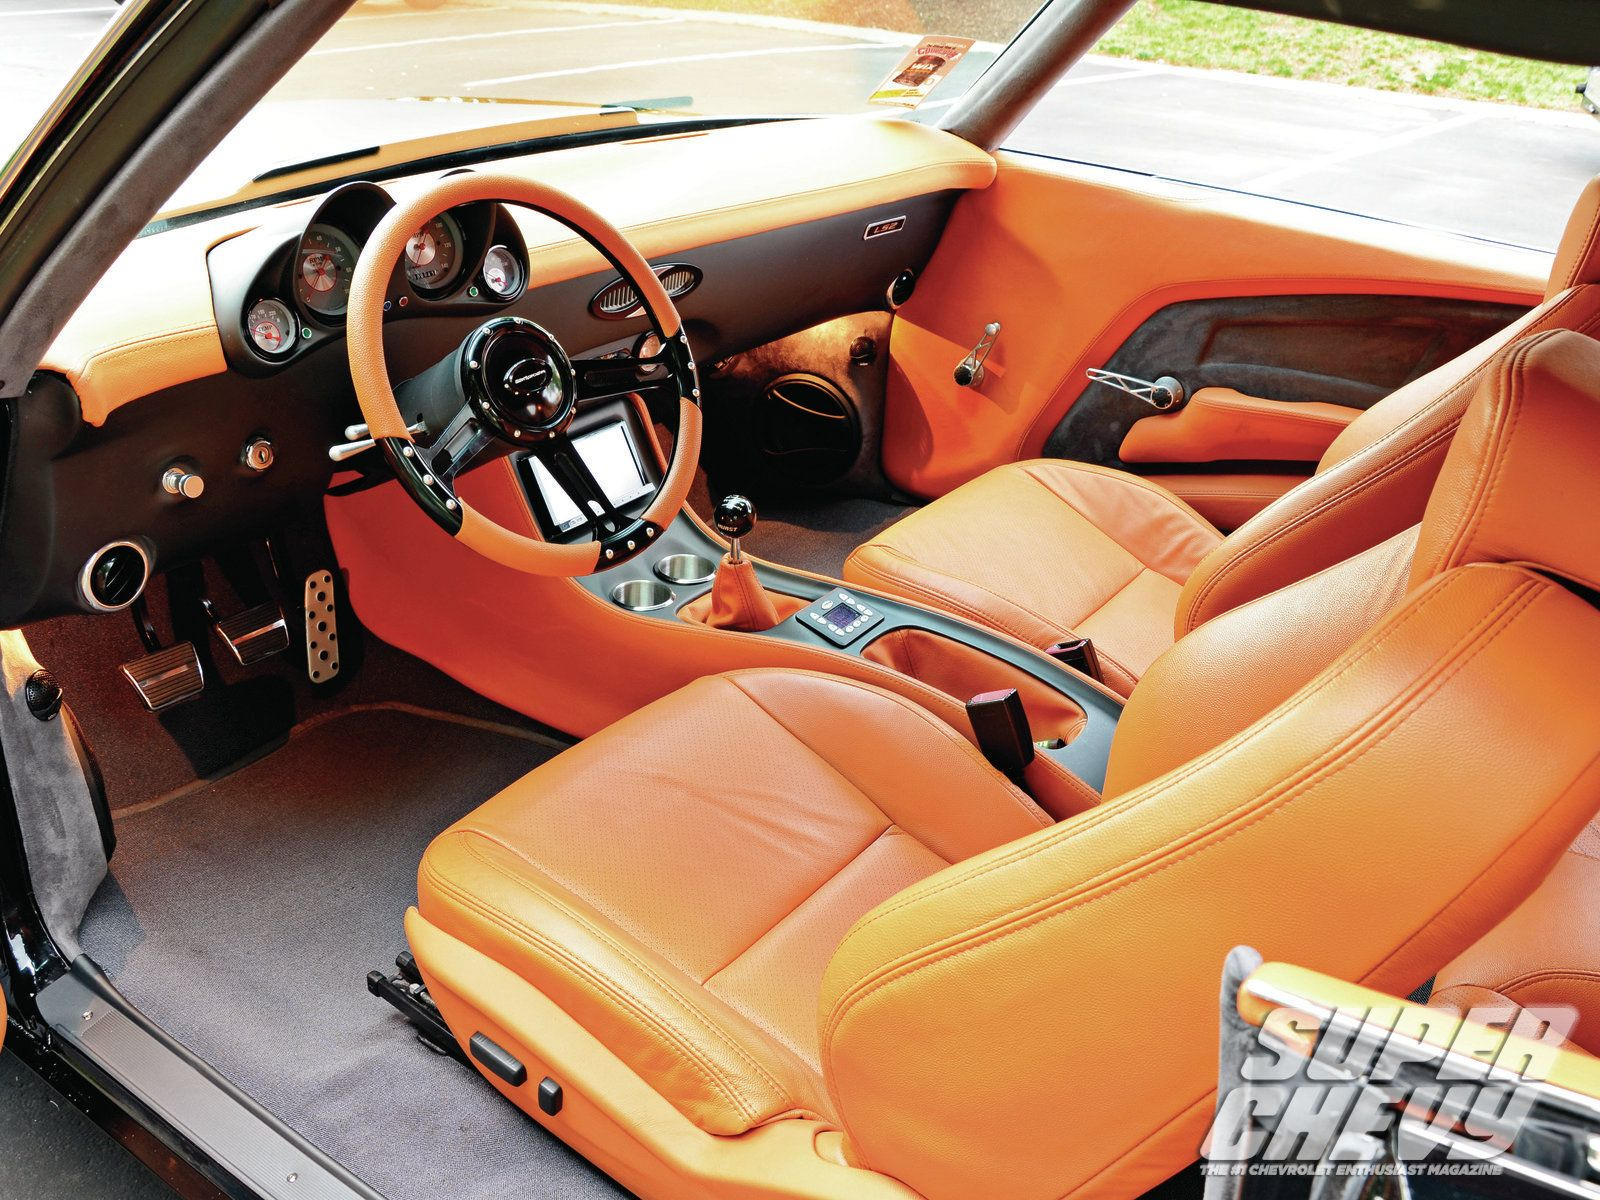 1970 chevrolet chevelle ss interior photo 6 custom dash and console door panels brown orange [ 1600 x 1200 Pixel ]